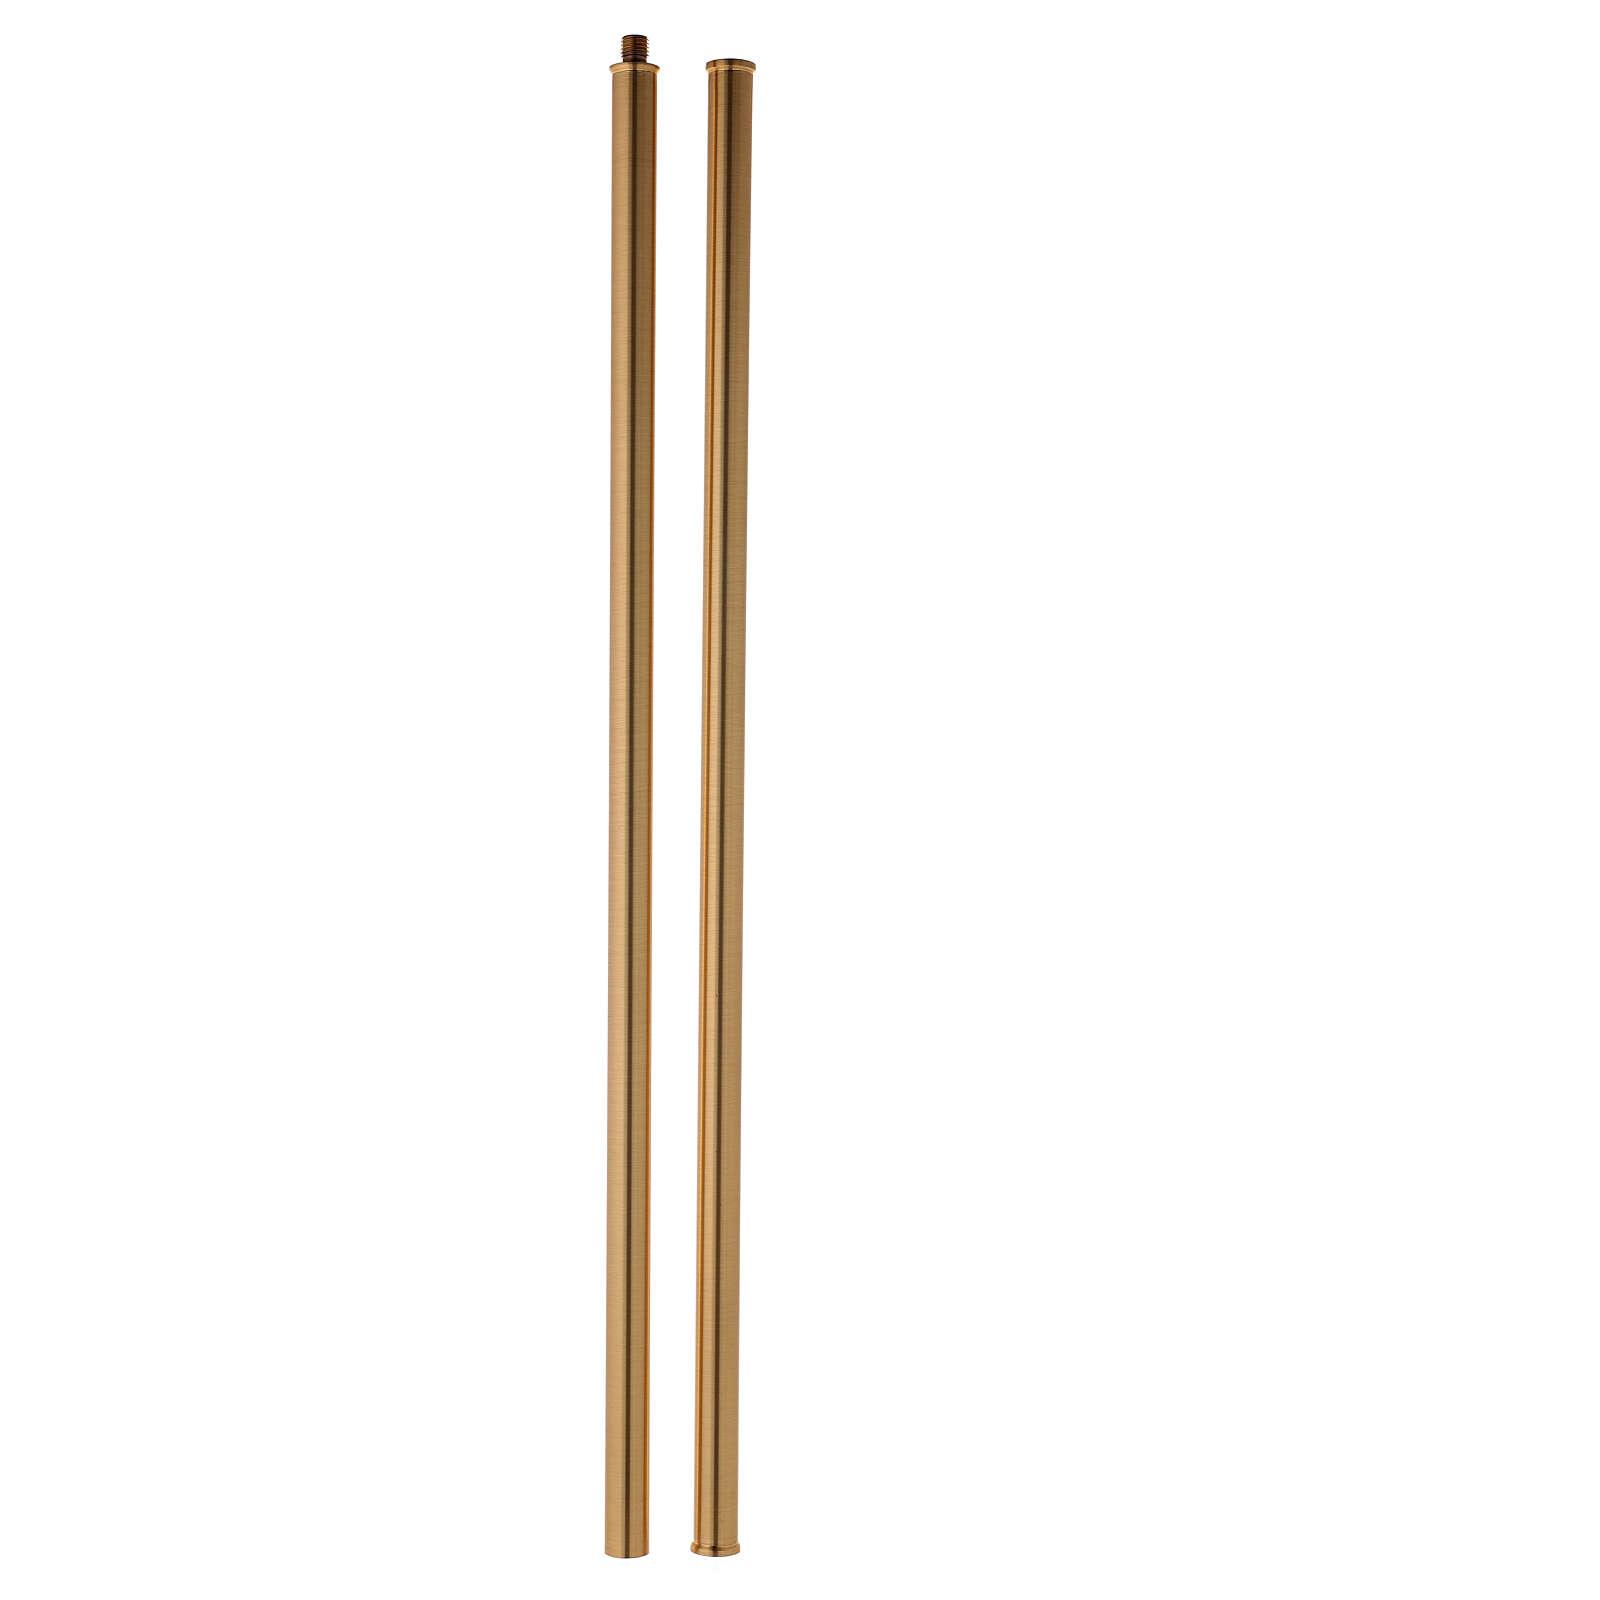 Cruz procesional de latón fundido 58x37 cm 4